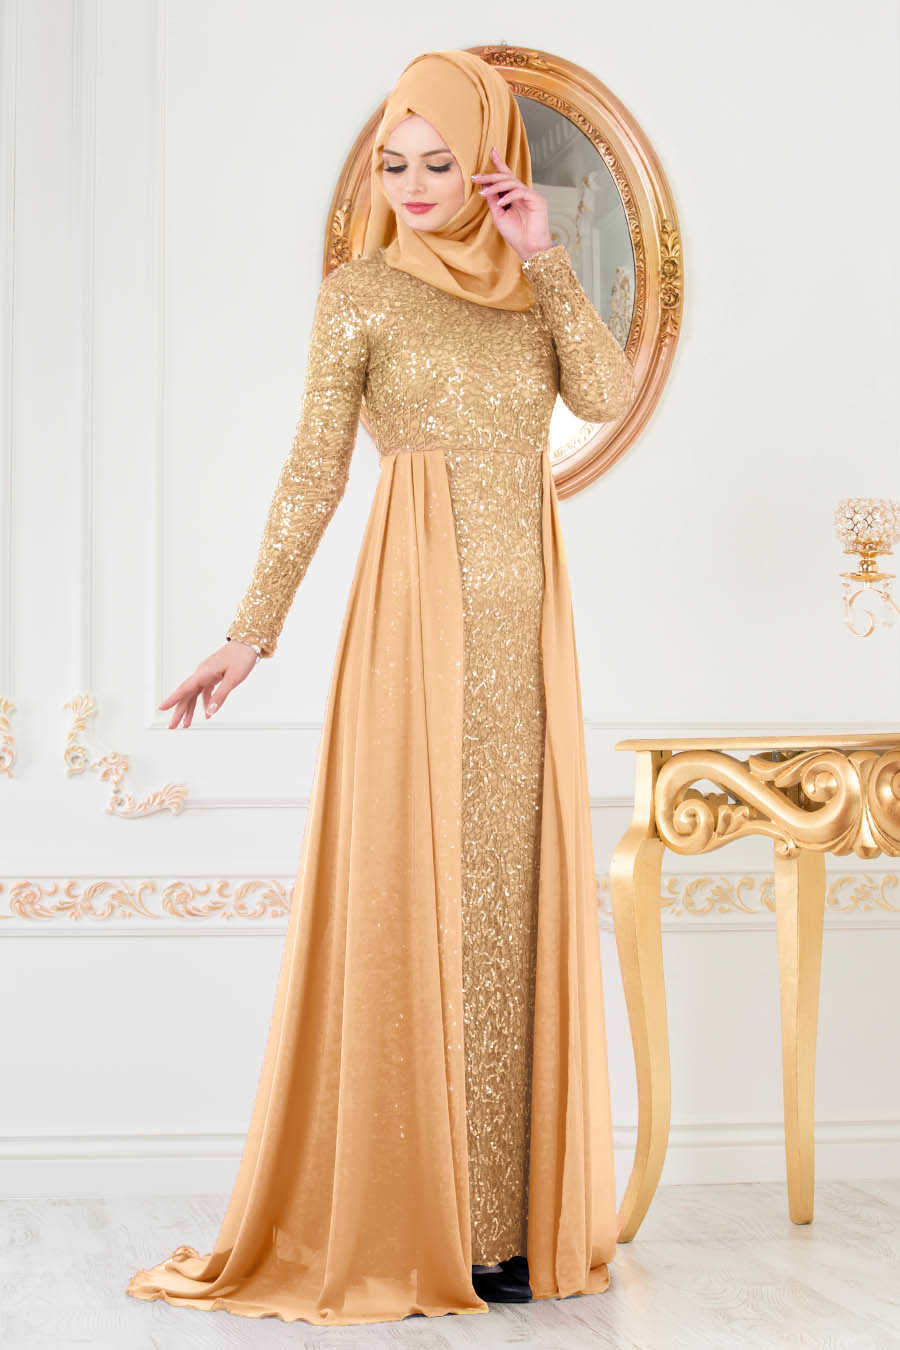 de4cecad320 Neva Style - Gold Hijab Evening Dress 90000GOLD - Neva-style.com